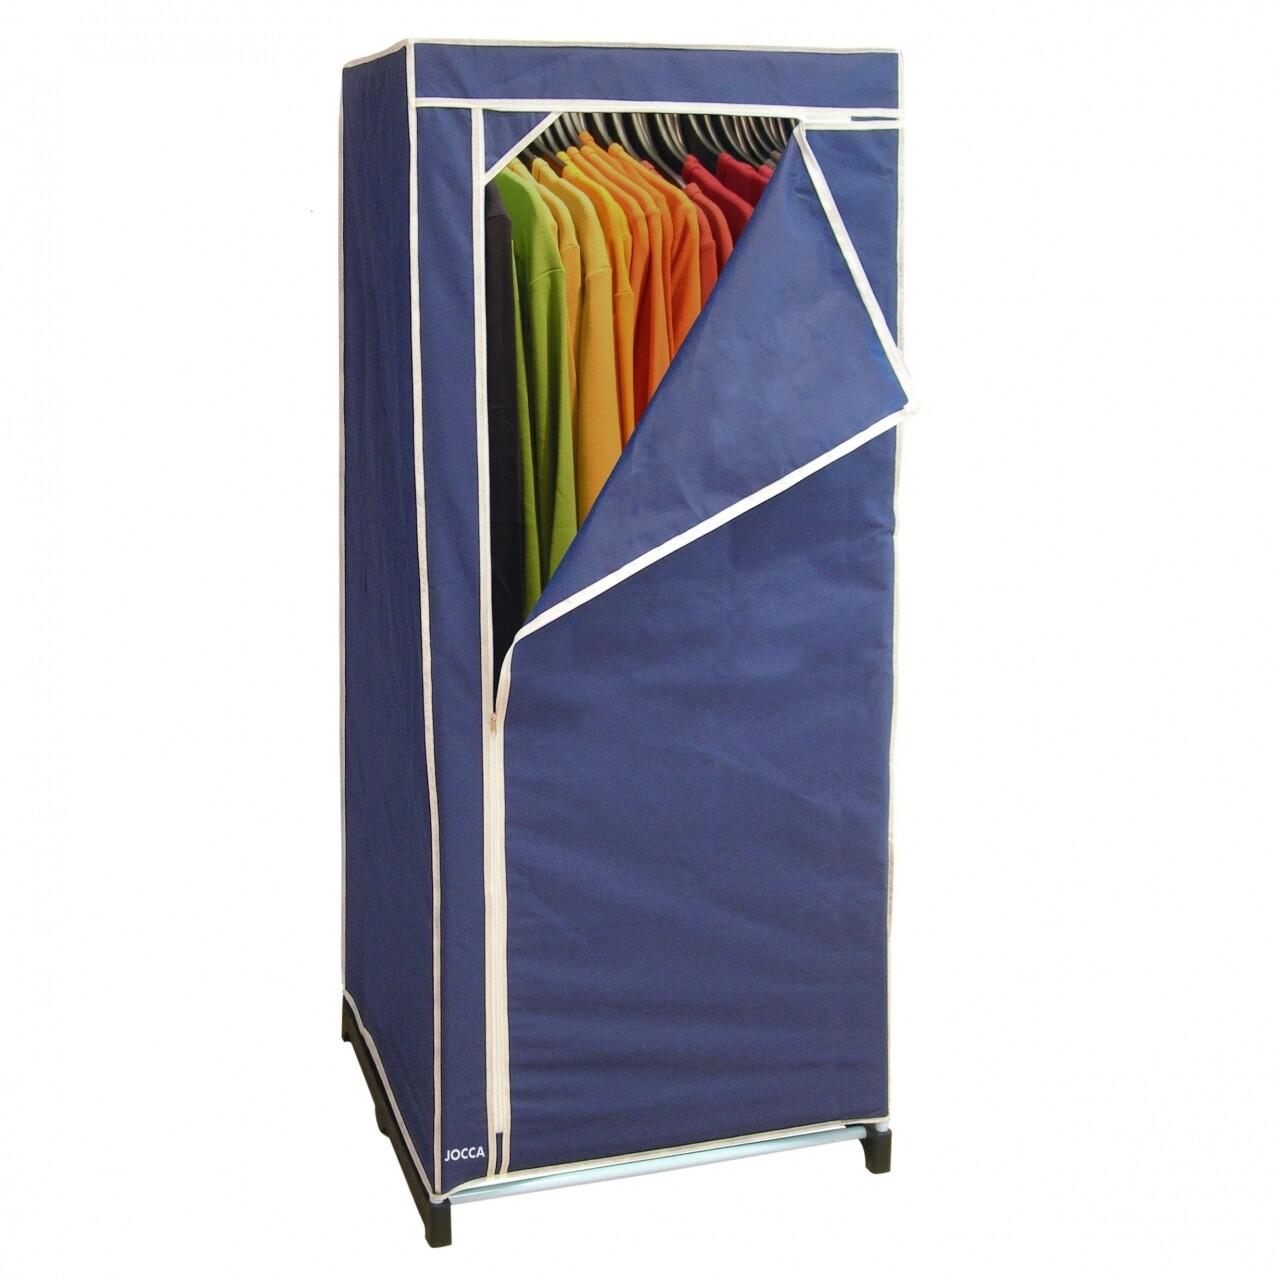 Dulap pentru haine, 60 x 45 x 148 cm, polipropilena/metal, bleu